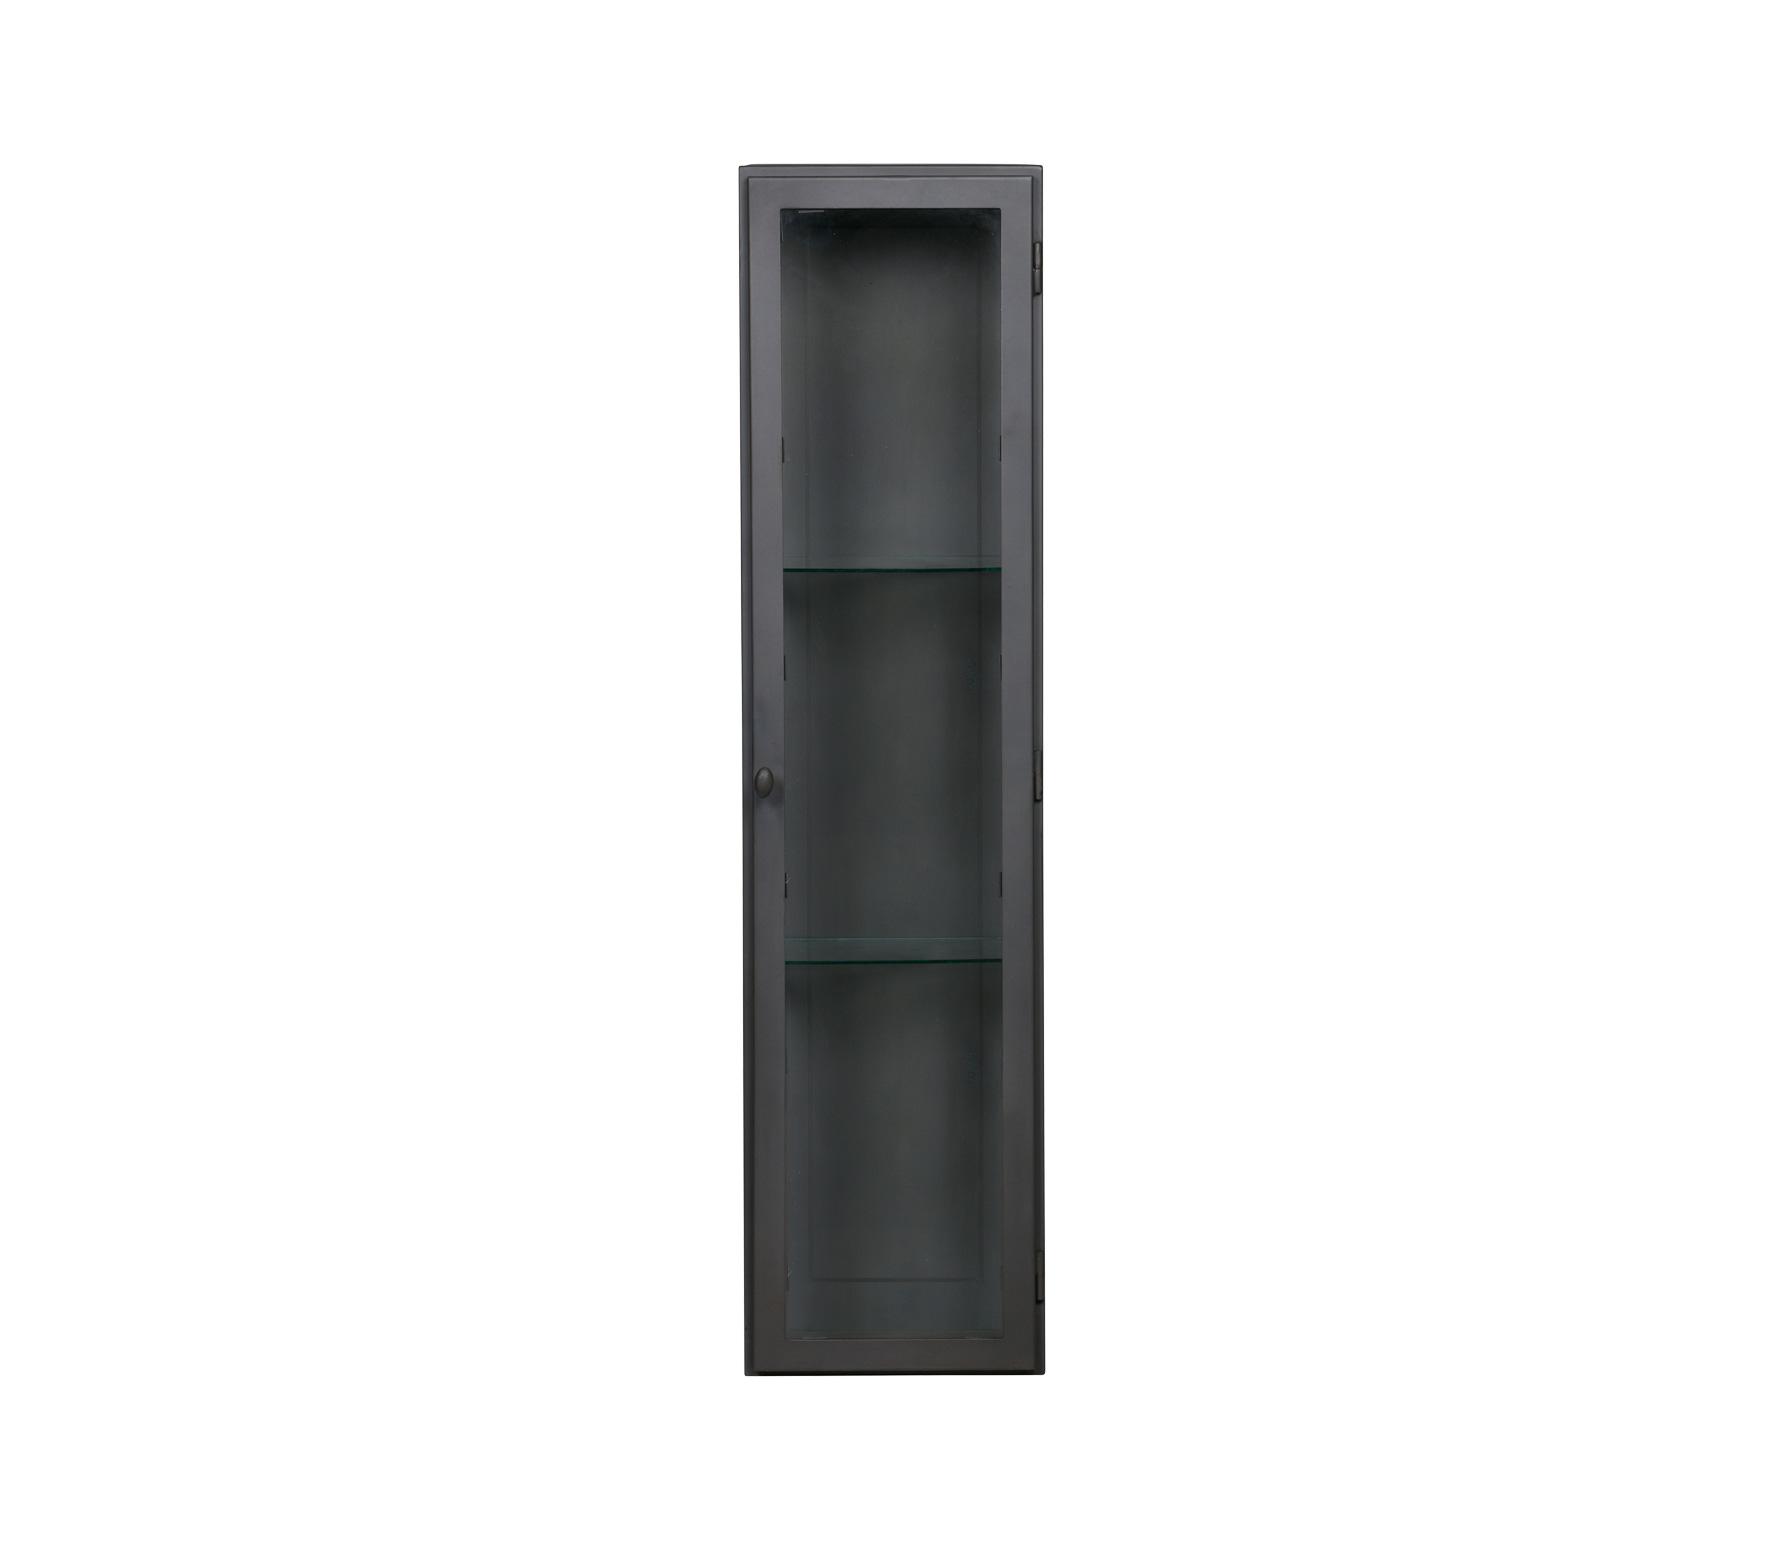 Hangende Vitrinekast Met Verlichting.Bepurehome Manta Hangende Vitrinekast Xl 120x30 Grijs Wordt Gratis